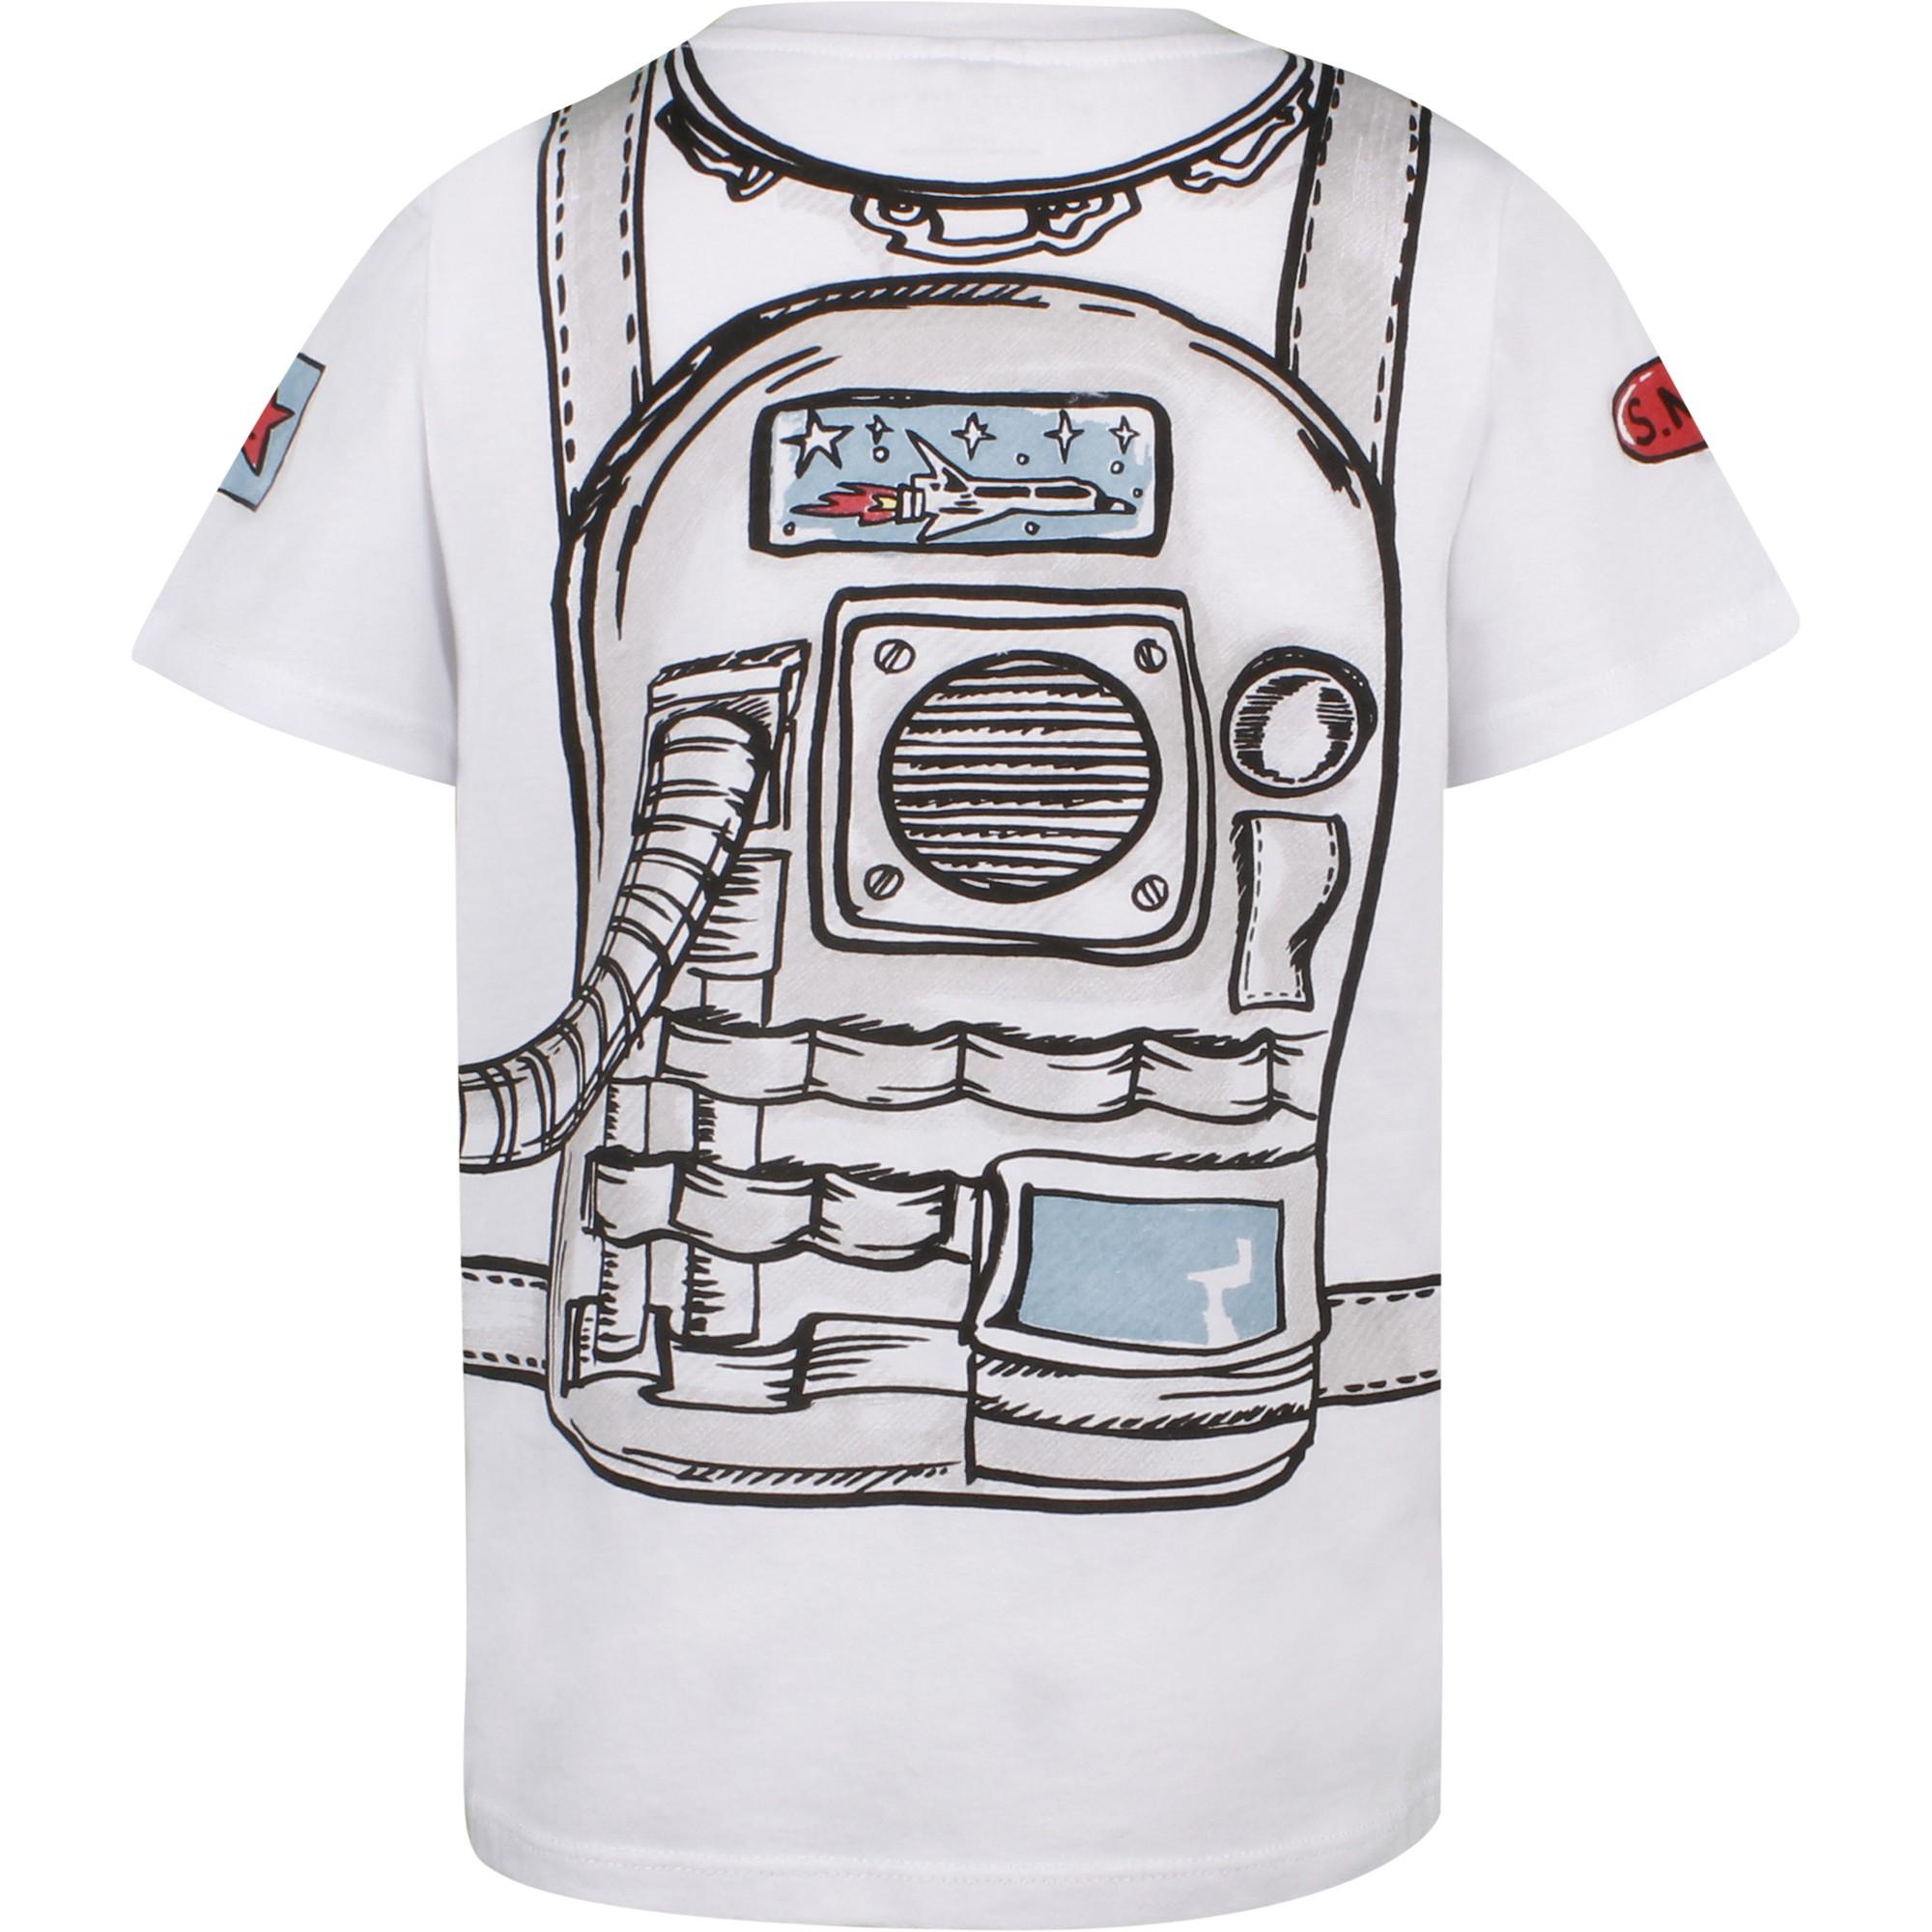 Stella McCartney Astronaut Suit T-Shirt - BAMBINIFASHION.COM